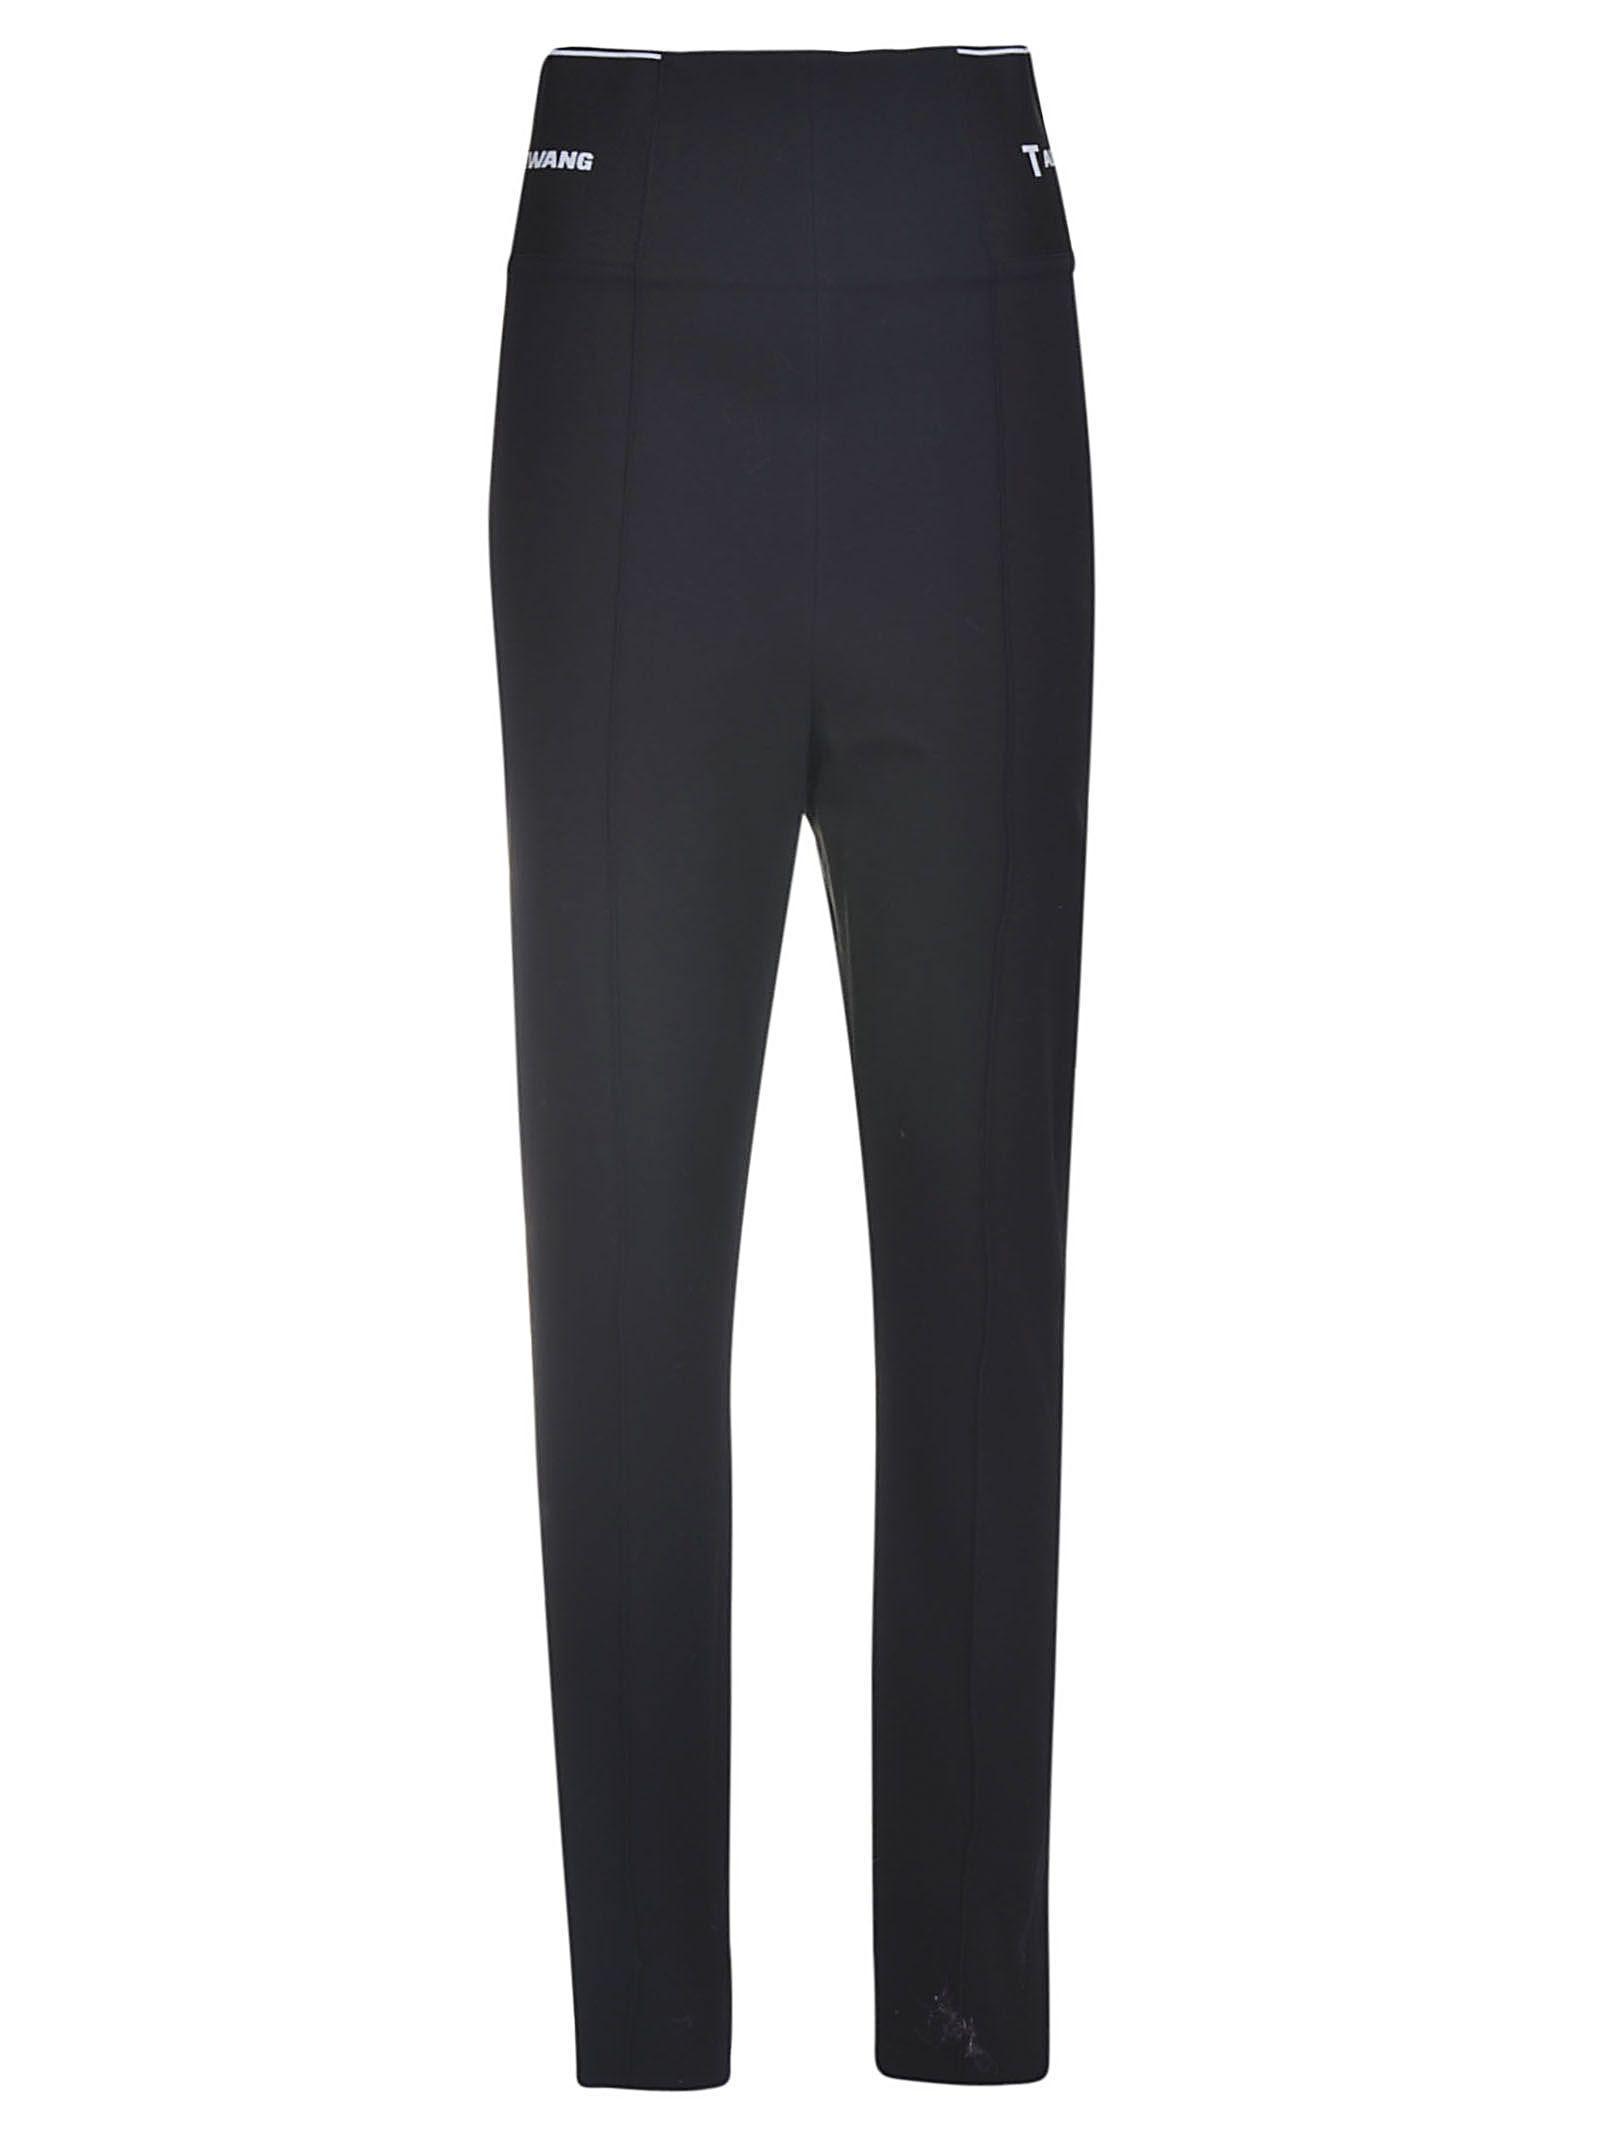 23427f912a3b1 Alexander Wang Logo Elastic Leggings In Black 001 | ModeSens